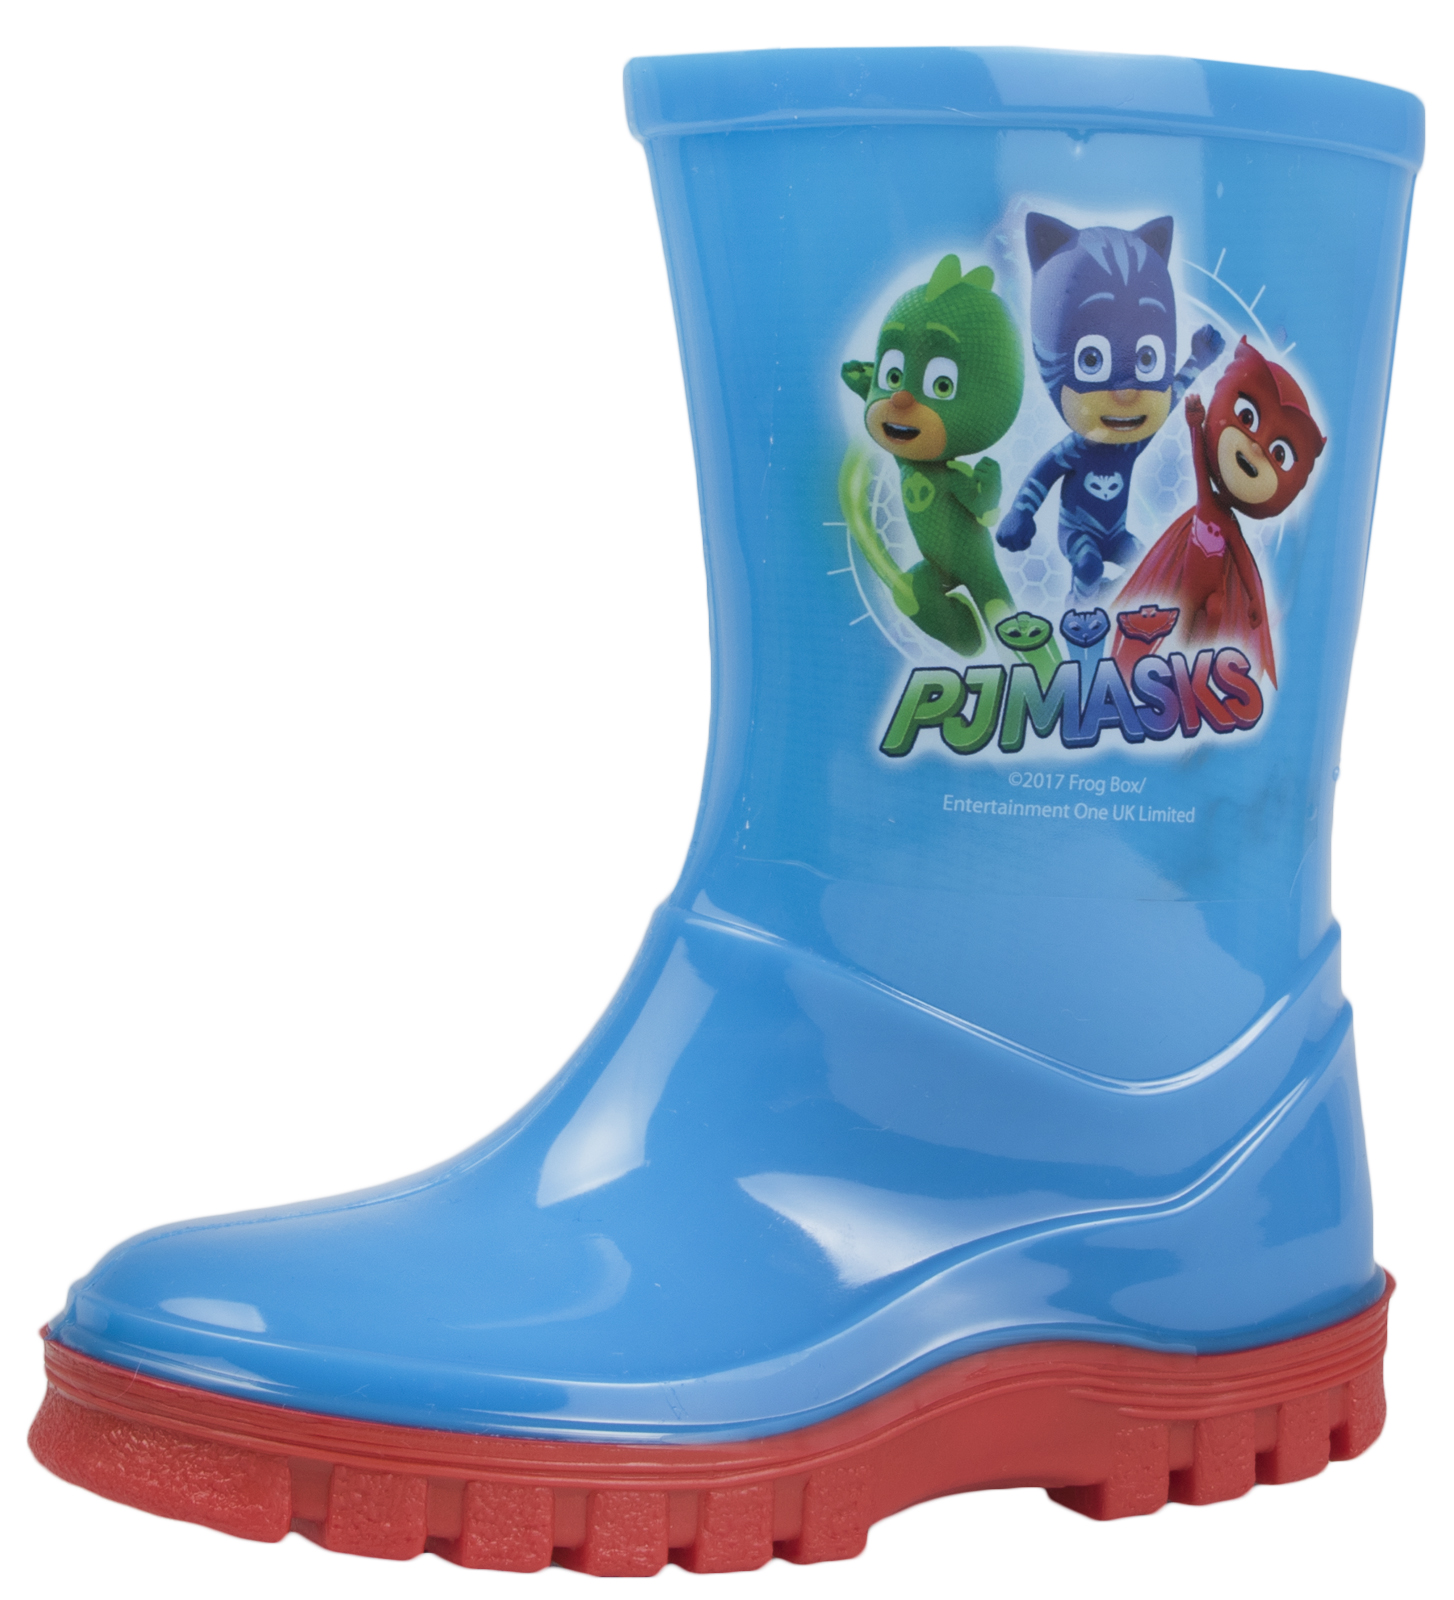 BOYS NEW PJ MASKS RUBBER WELLIES WELLY WELLINGTON RAIN SNOW BOOTS SIZE 5-12